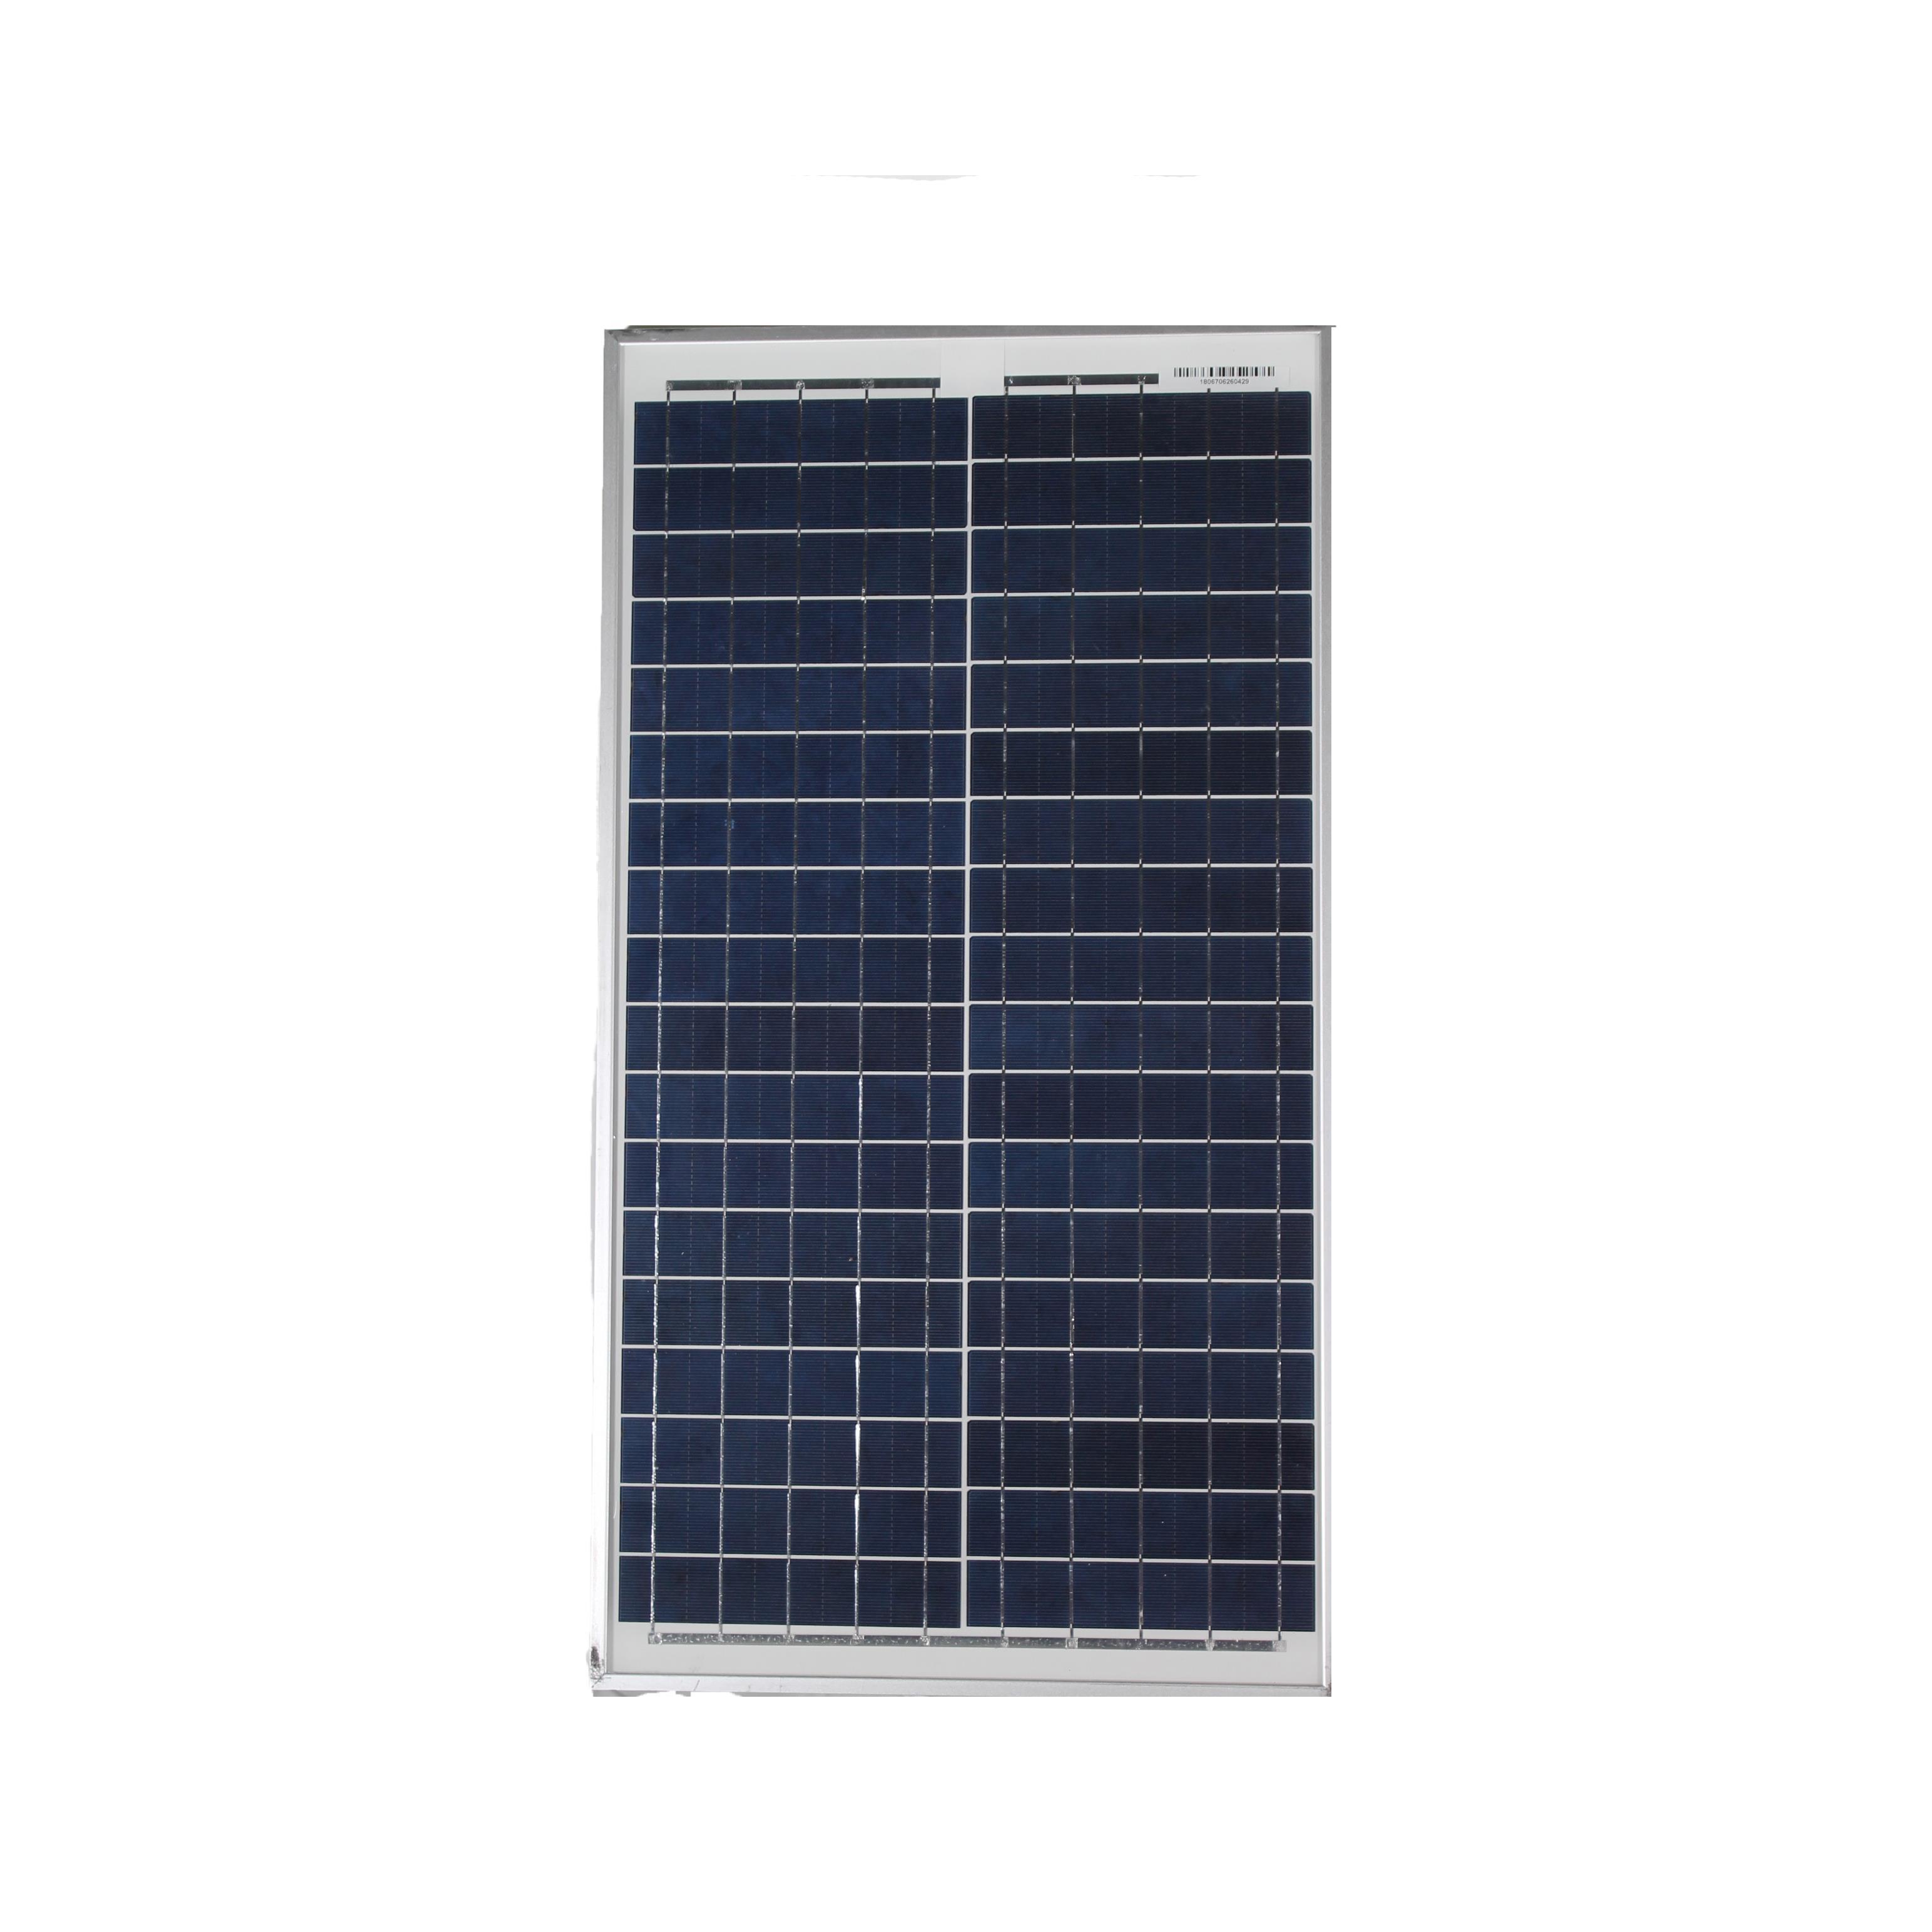 Dual 5 X 8 Solar Led Sign Lighting Kit With 1 700 Lumens